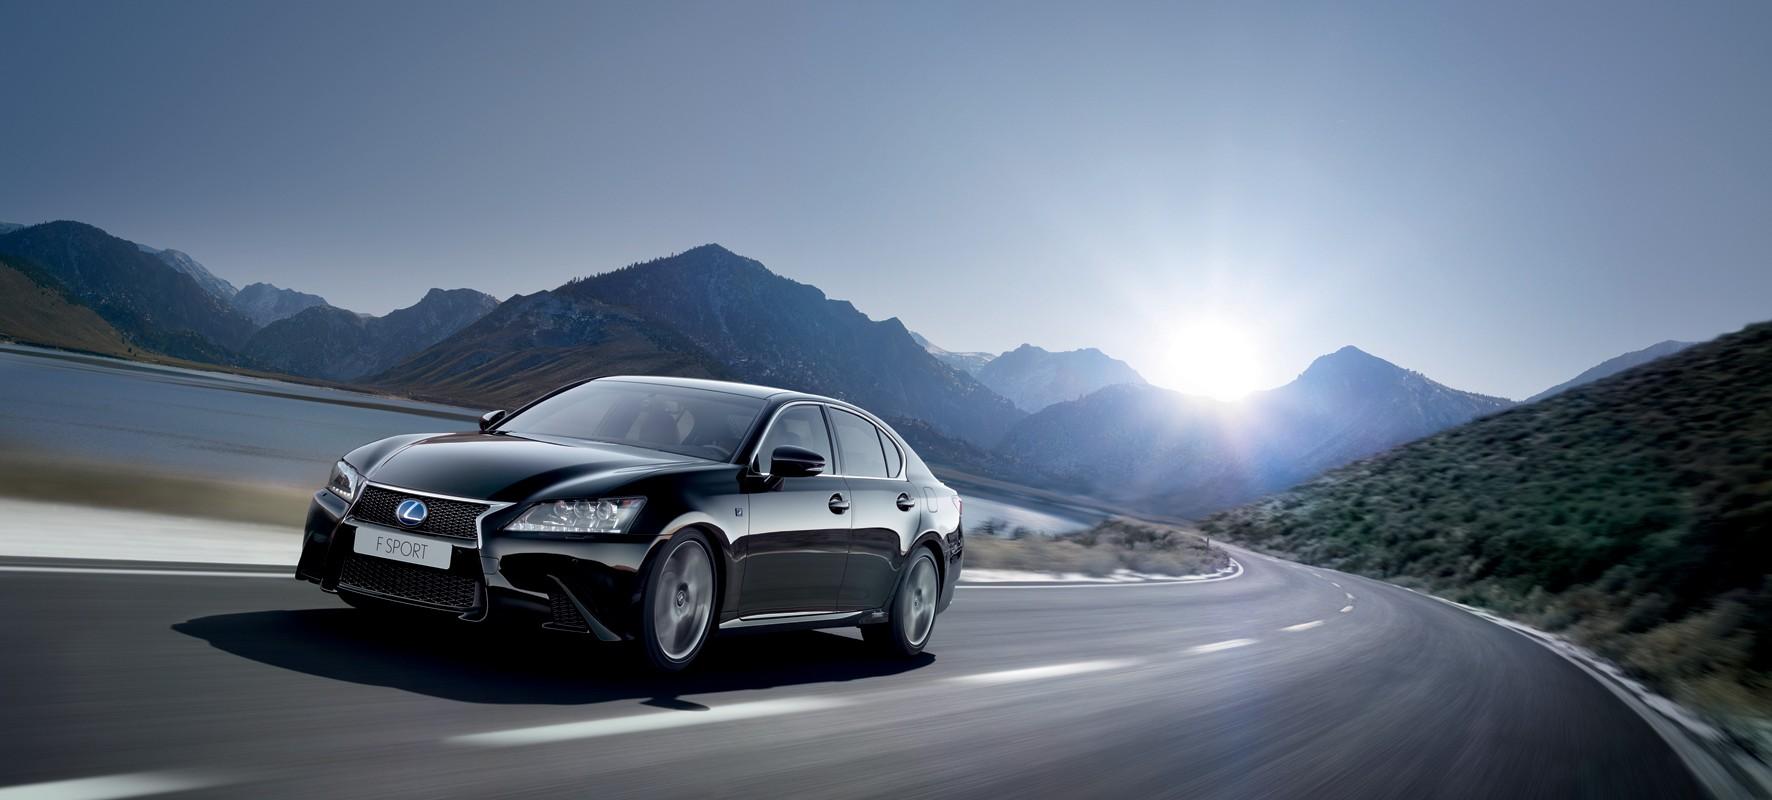 Lexus op de sportieve toer in Genève